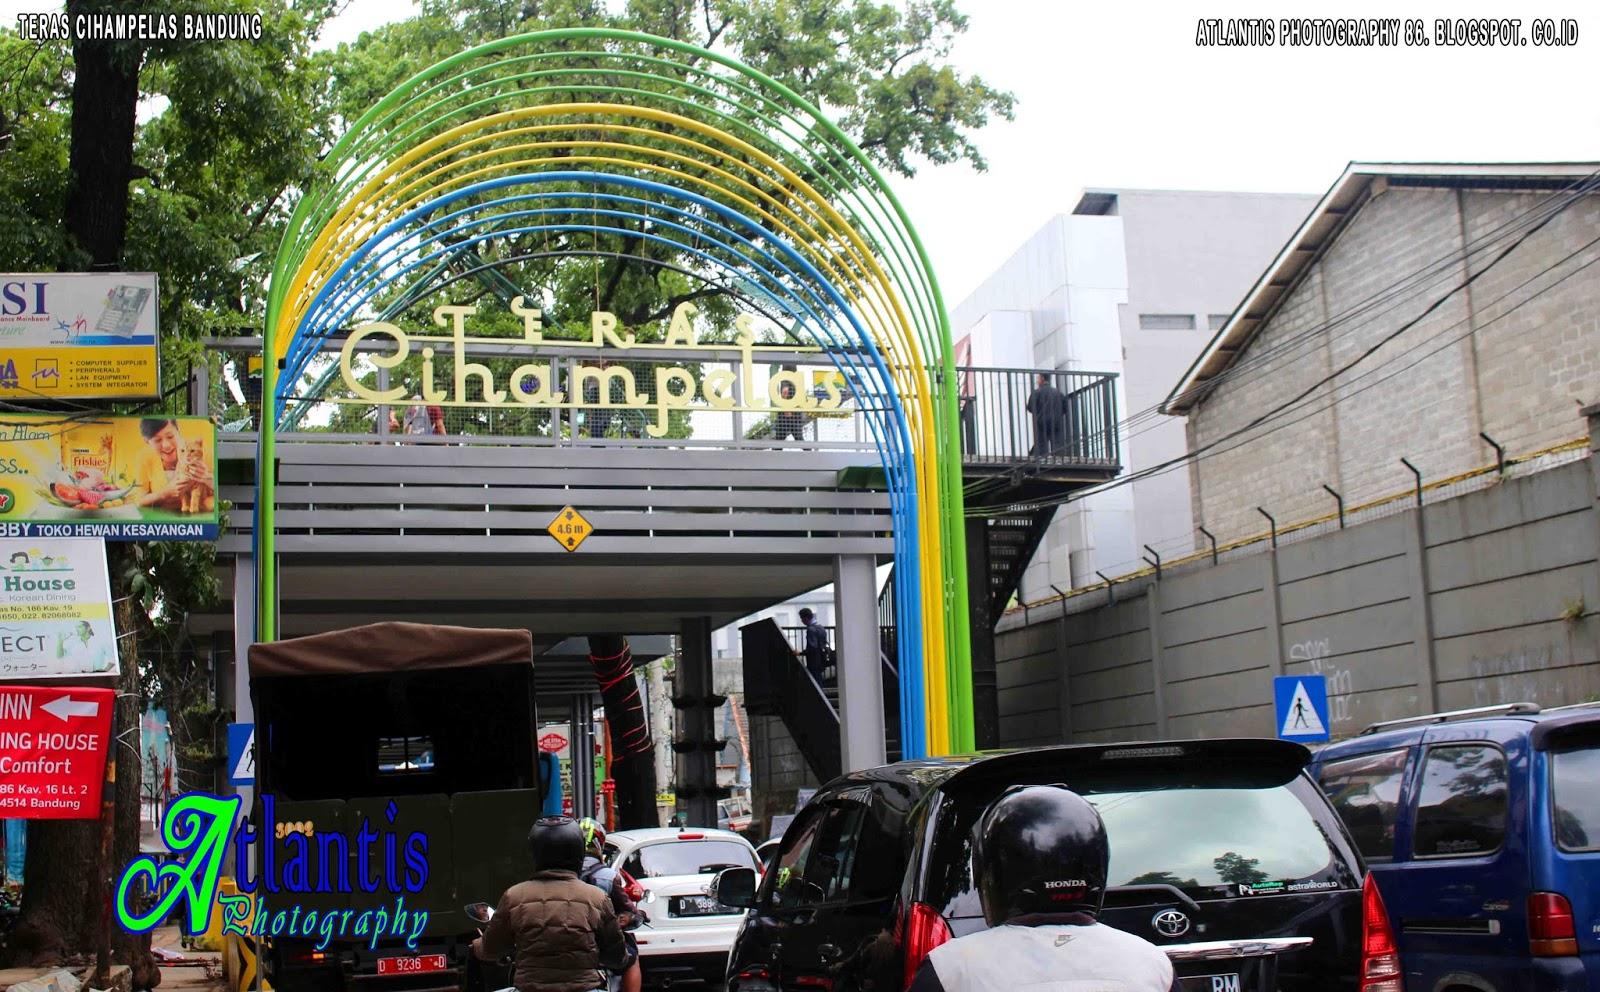 Atlantis Photography Krui Kunjungan Walikota Bandung Ridwan Kamil Teras Cihampelas